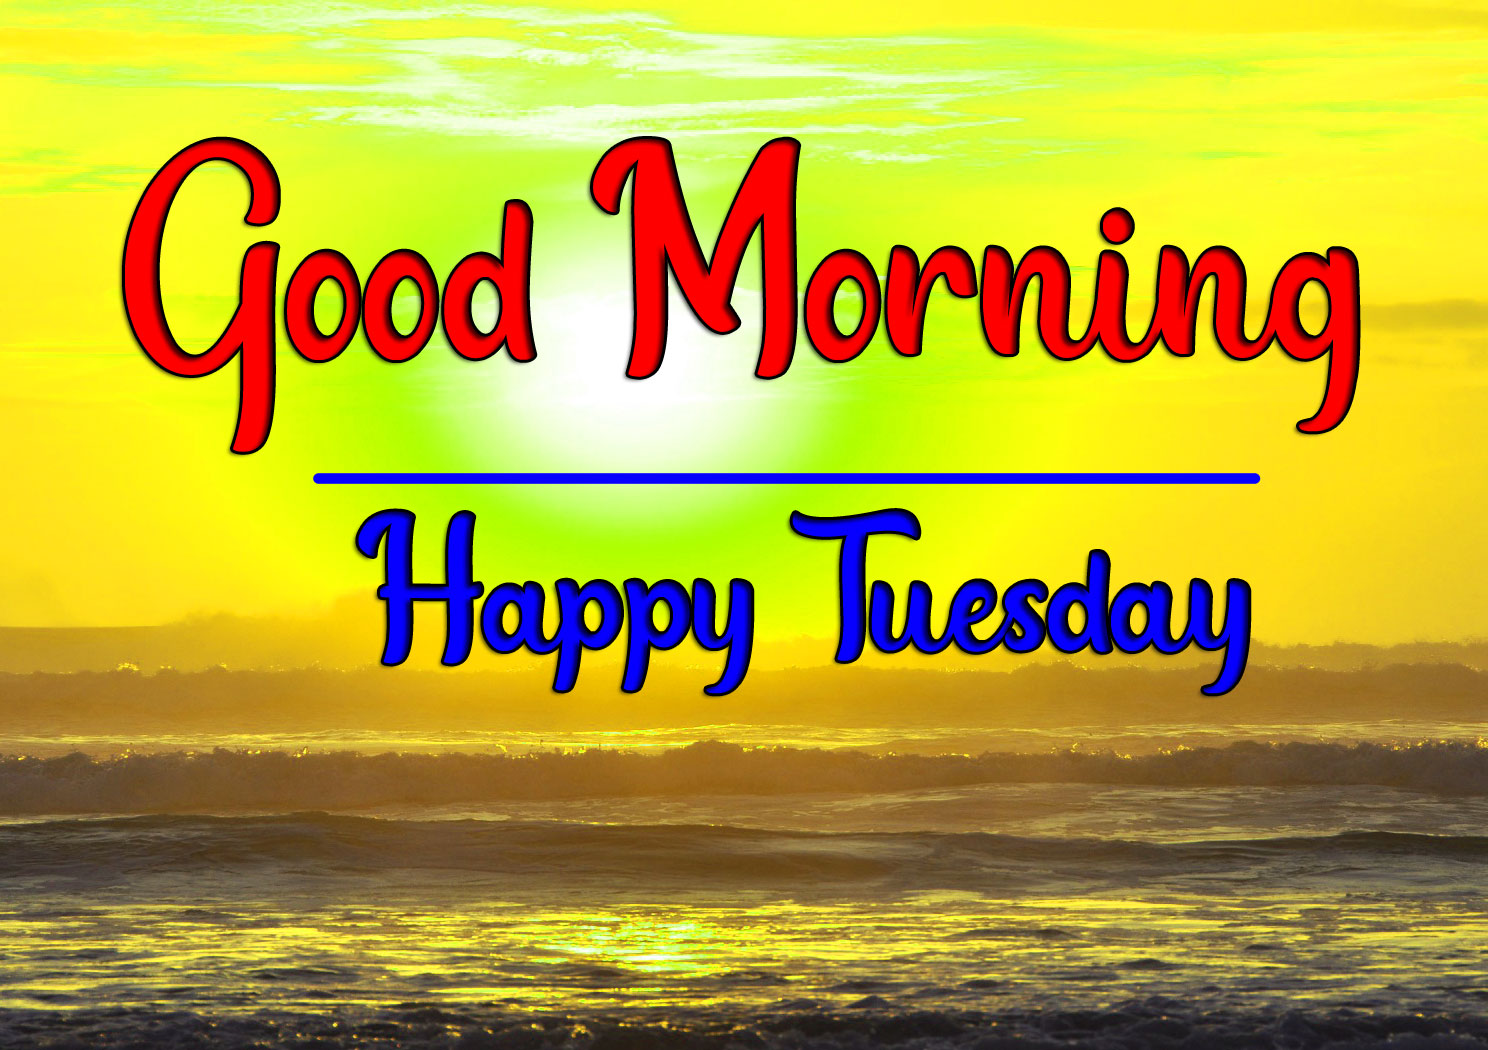 Tuesday Good morning Pics Free 2